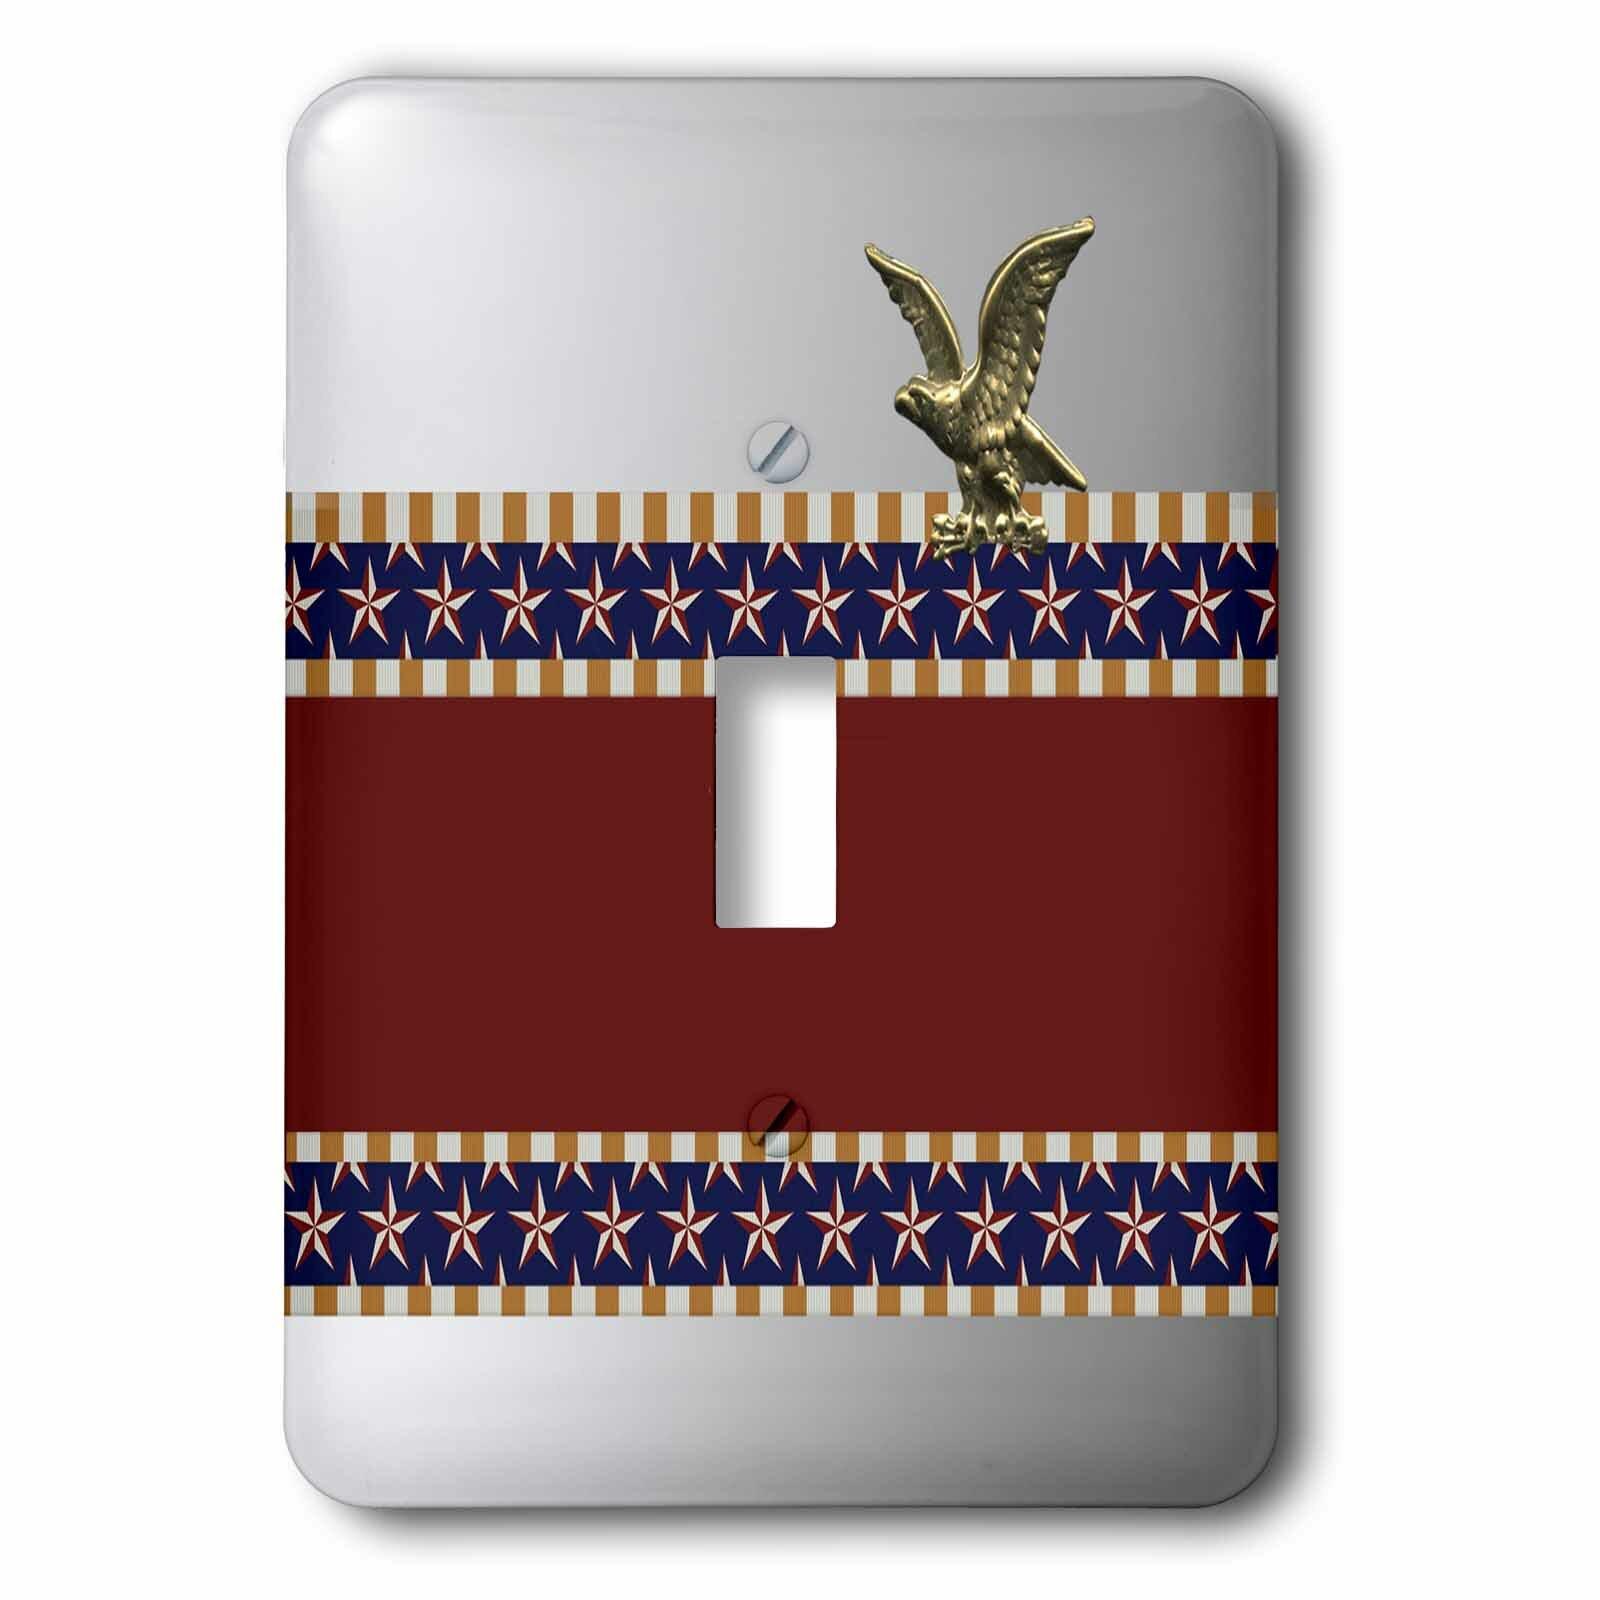 3drose Gold Eagle Stars 1 Gang Toggle Light Switch Wall Plate Wayfair